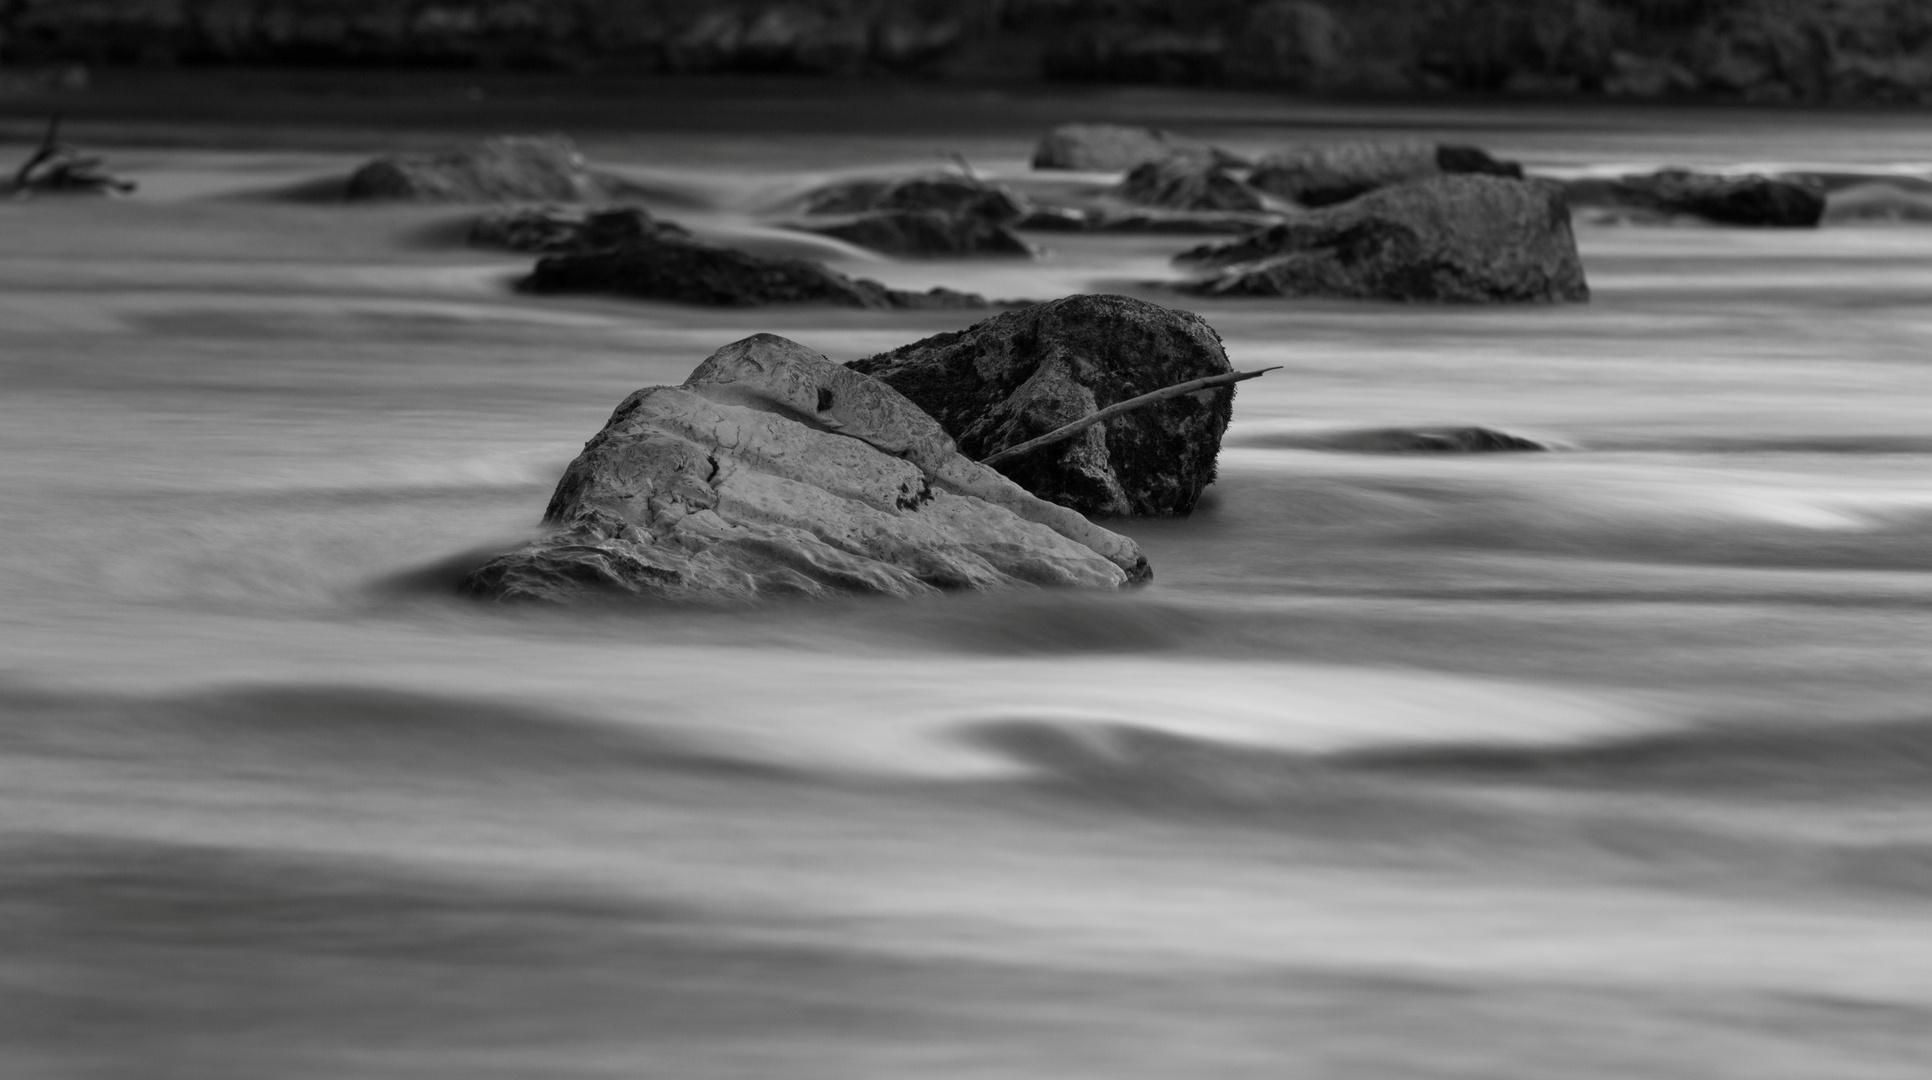 Rocks & Waves 1